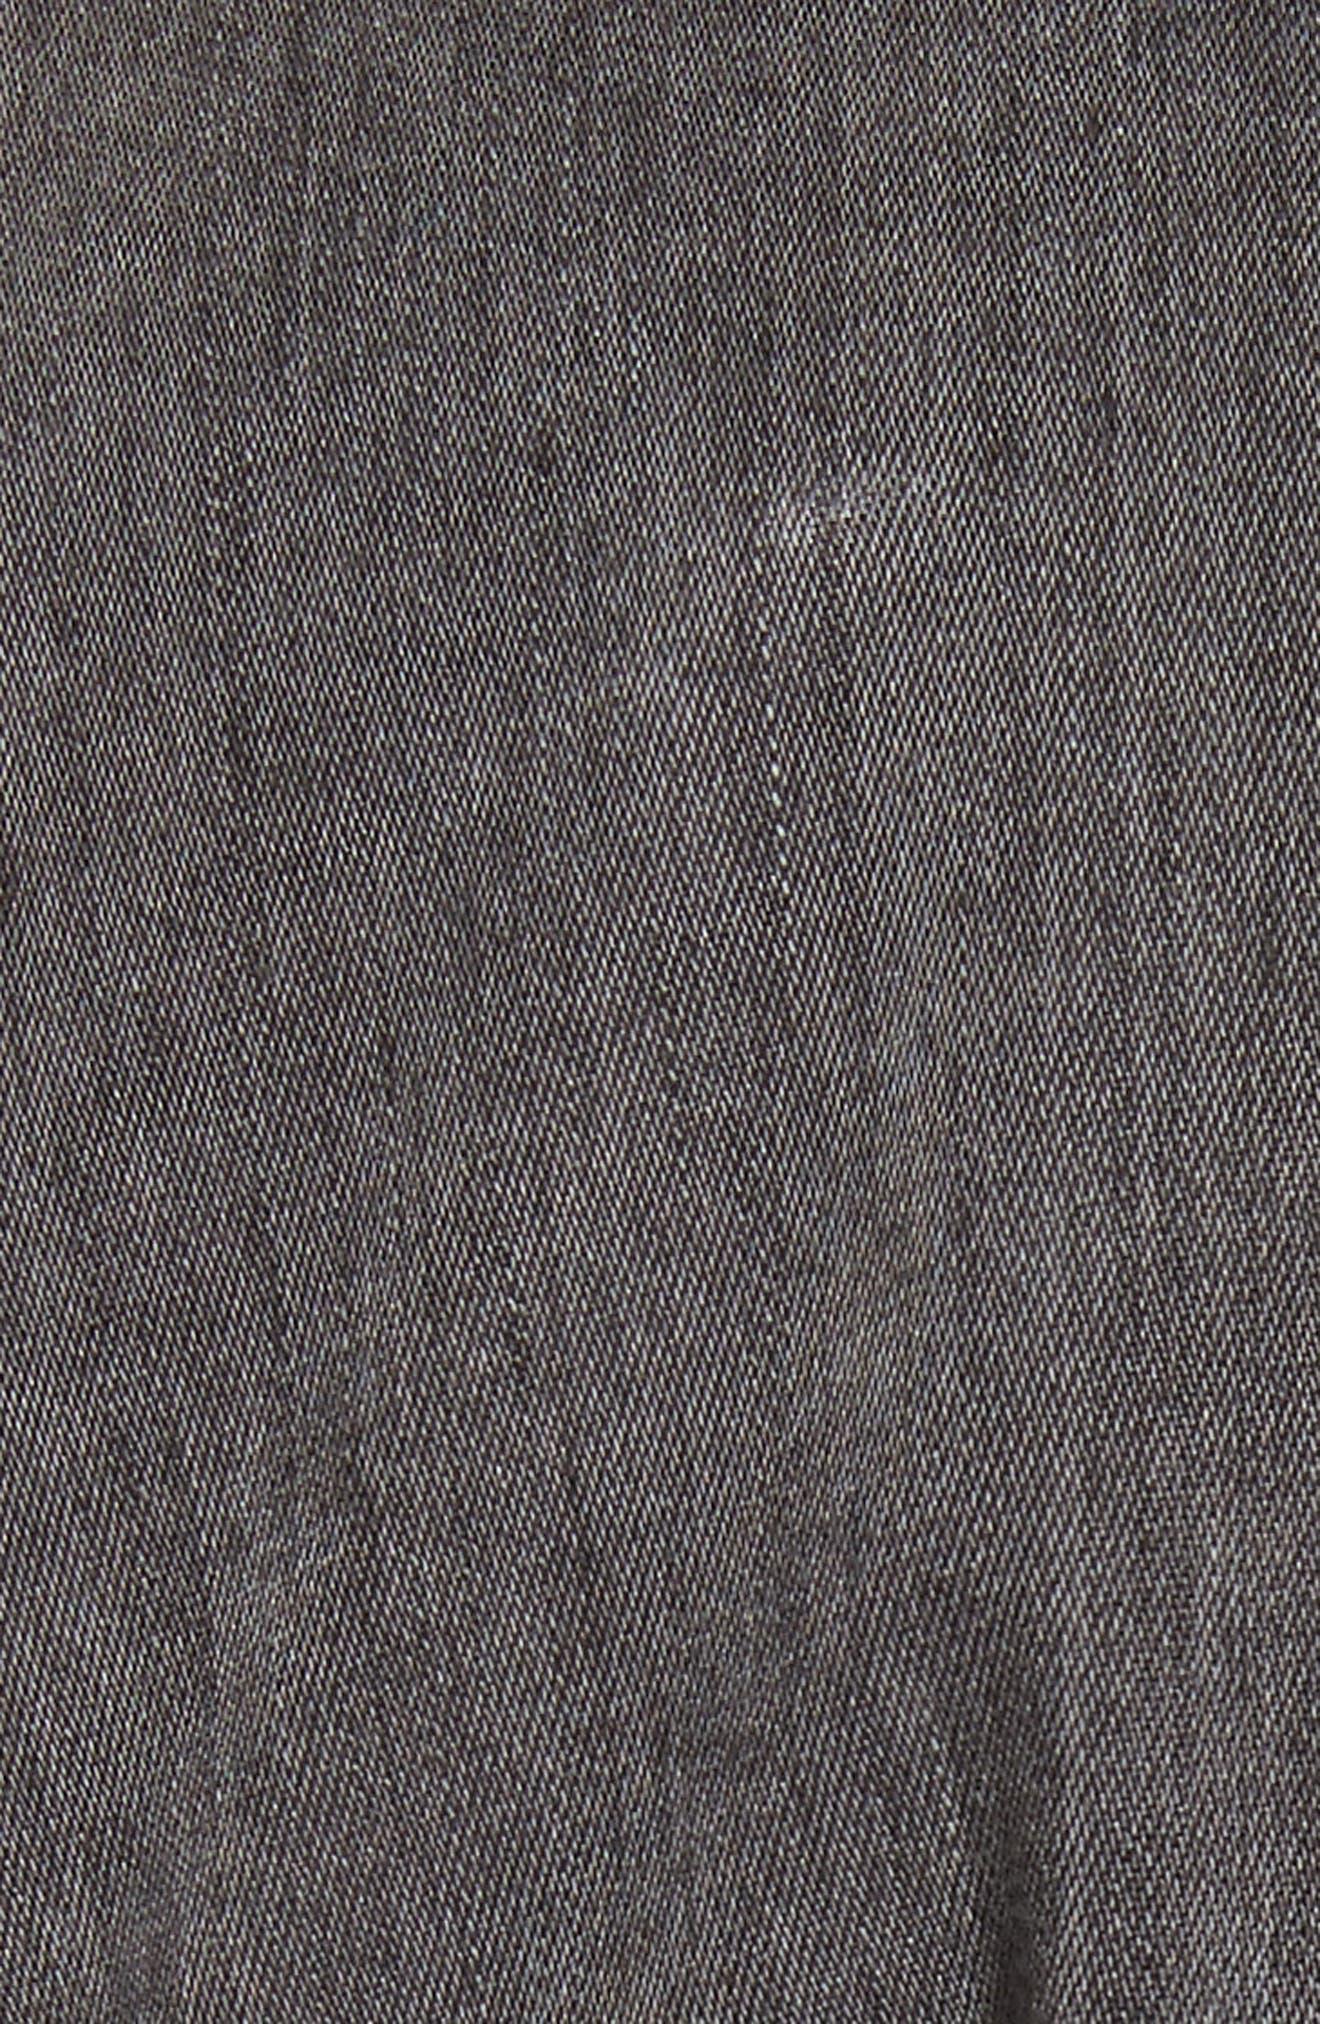 Denim Jumpsuit,                             Alternate thumbnail 5, color,                             Greystone Wash